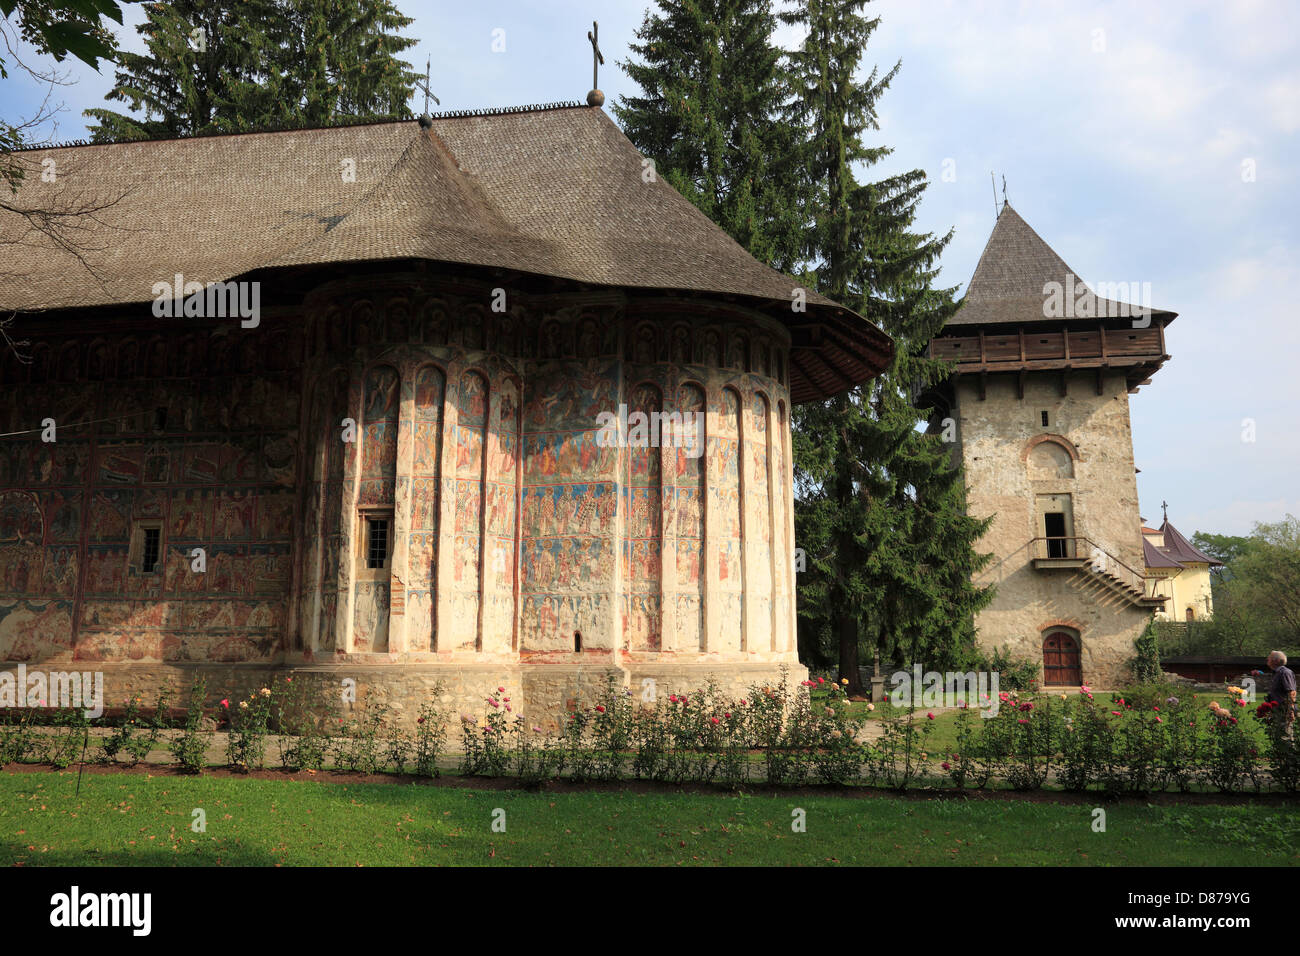 Humor Monastery located in Manastirea Humorului, about 5 km north of the town of Gura Humorului, Romania. It is - Stock Image